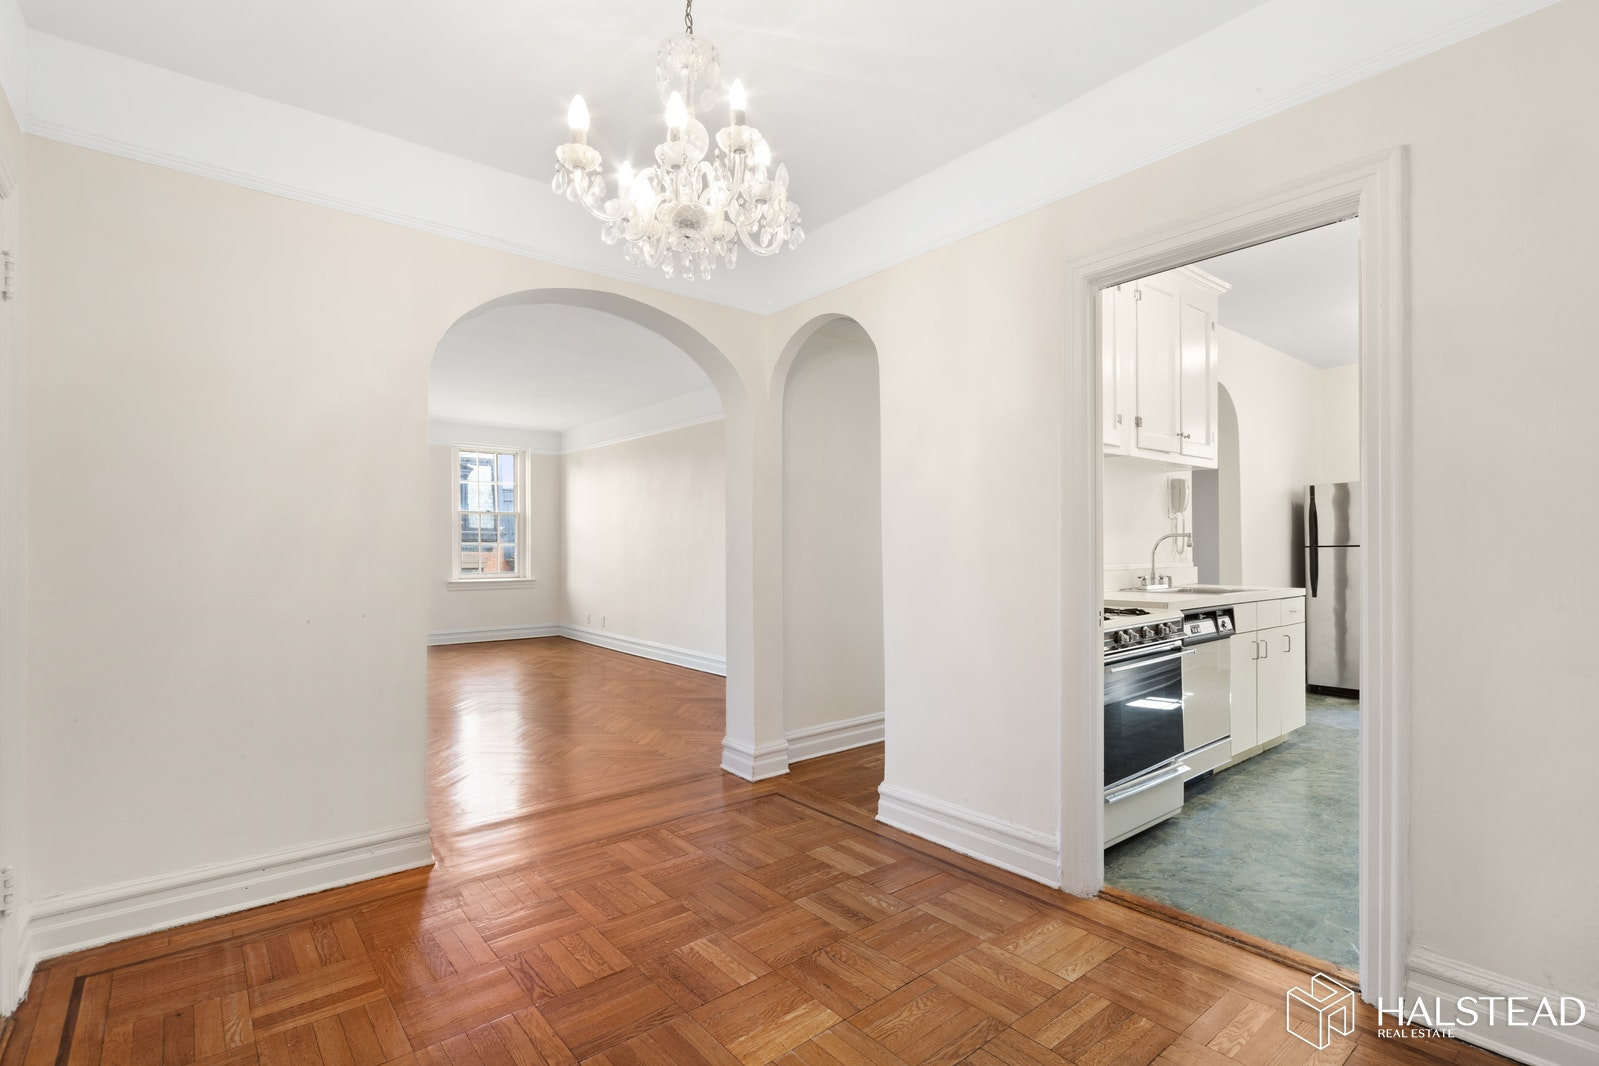 Apartment for sale at 20 Pierrepont Street, Apt 5D